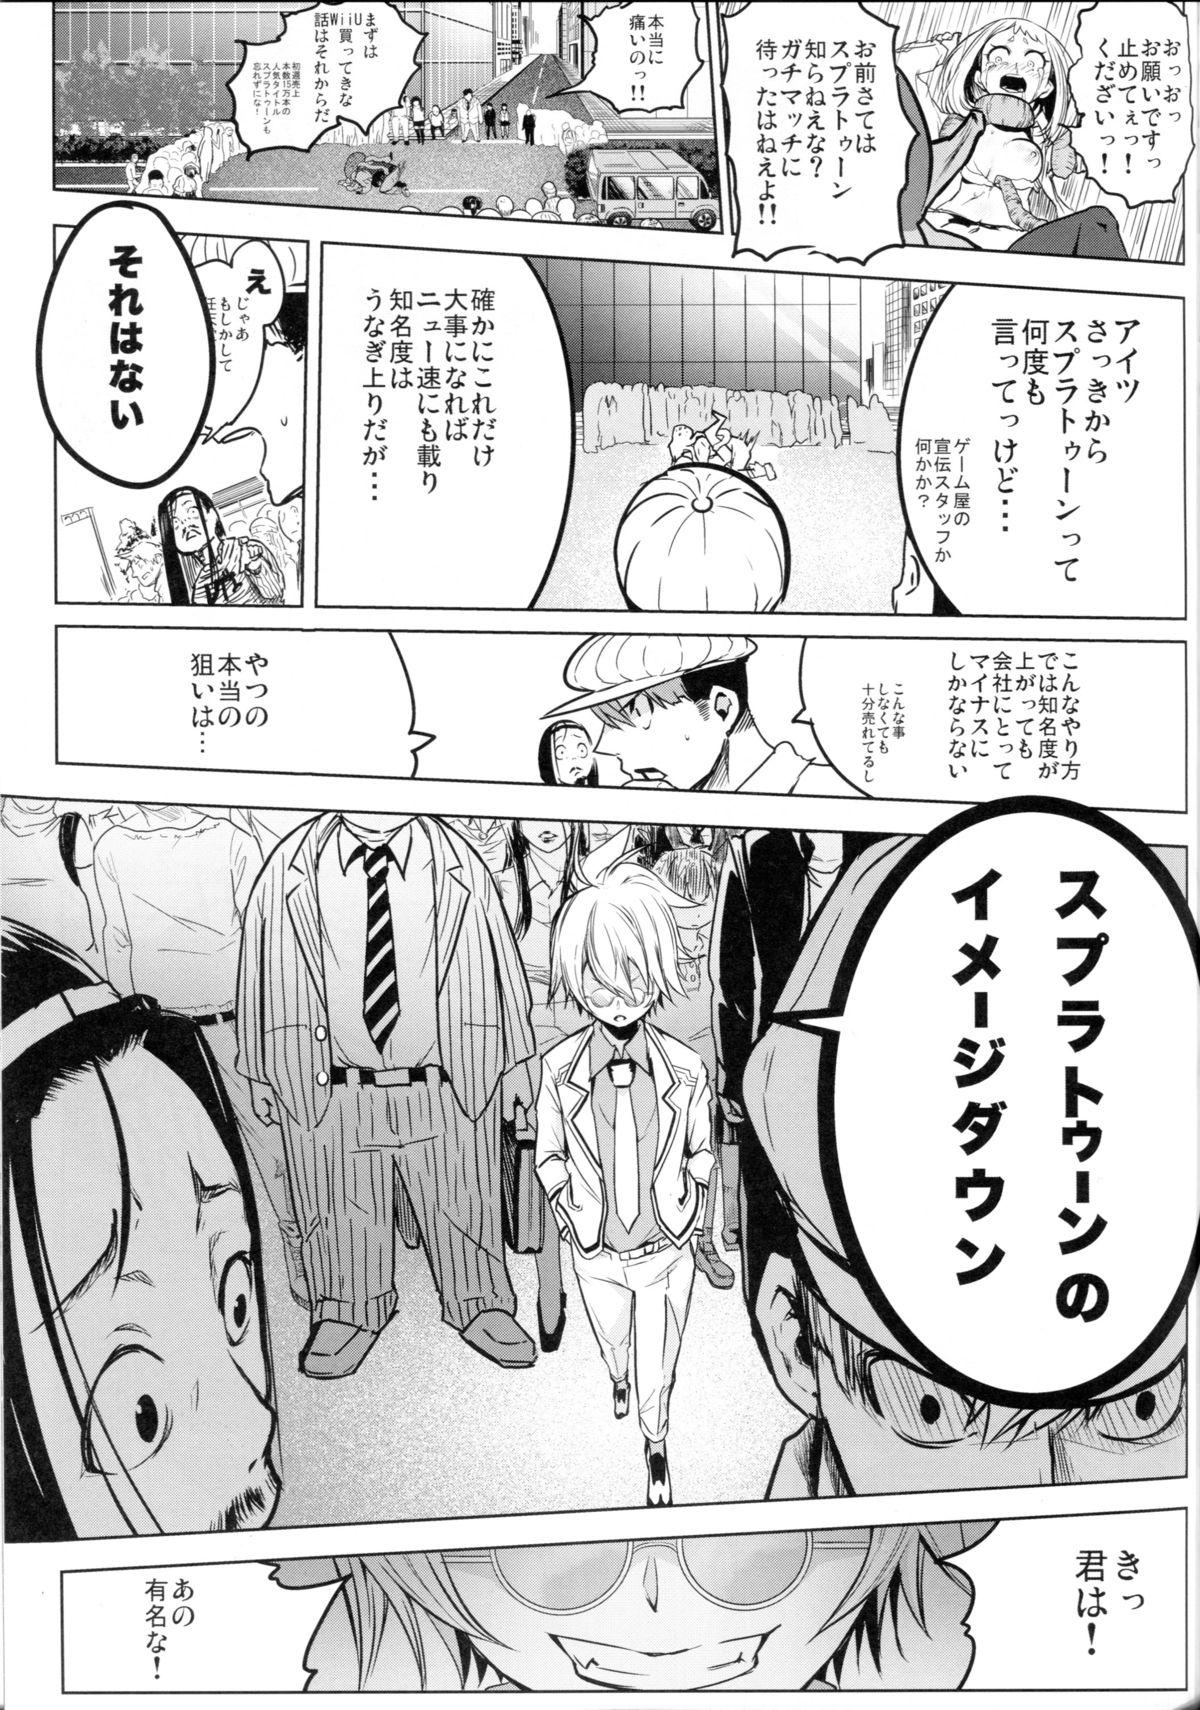 Saredo Uraraka ni! Ikari no Gachimacchi - Still Behave Uraraka! 14